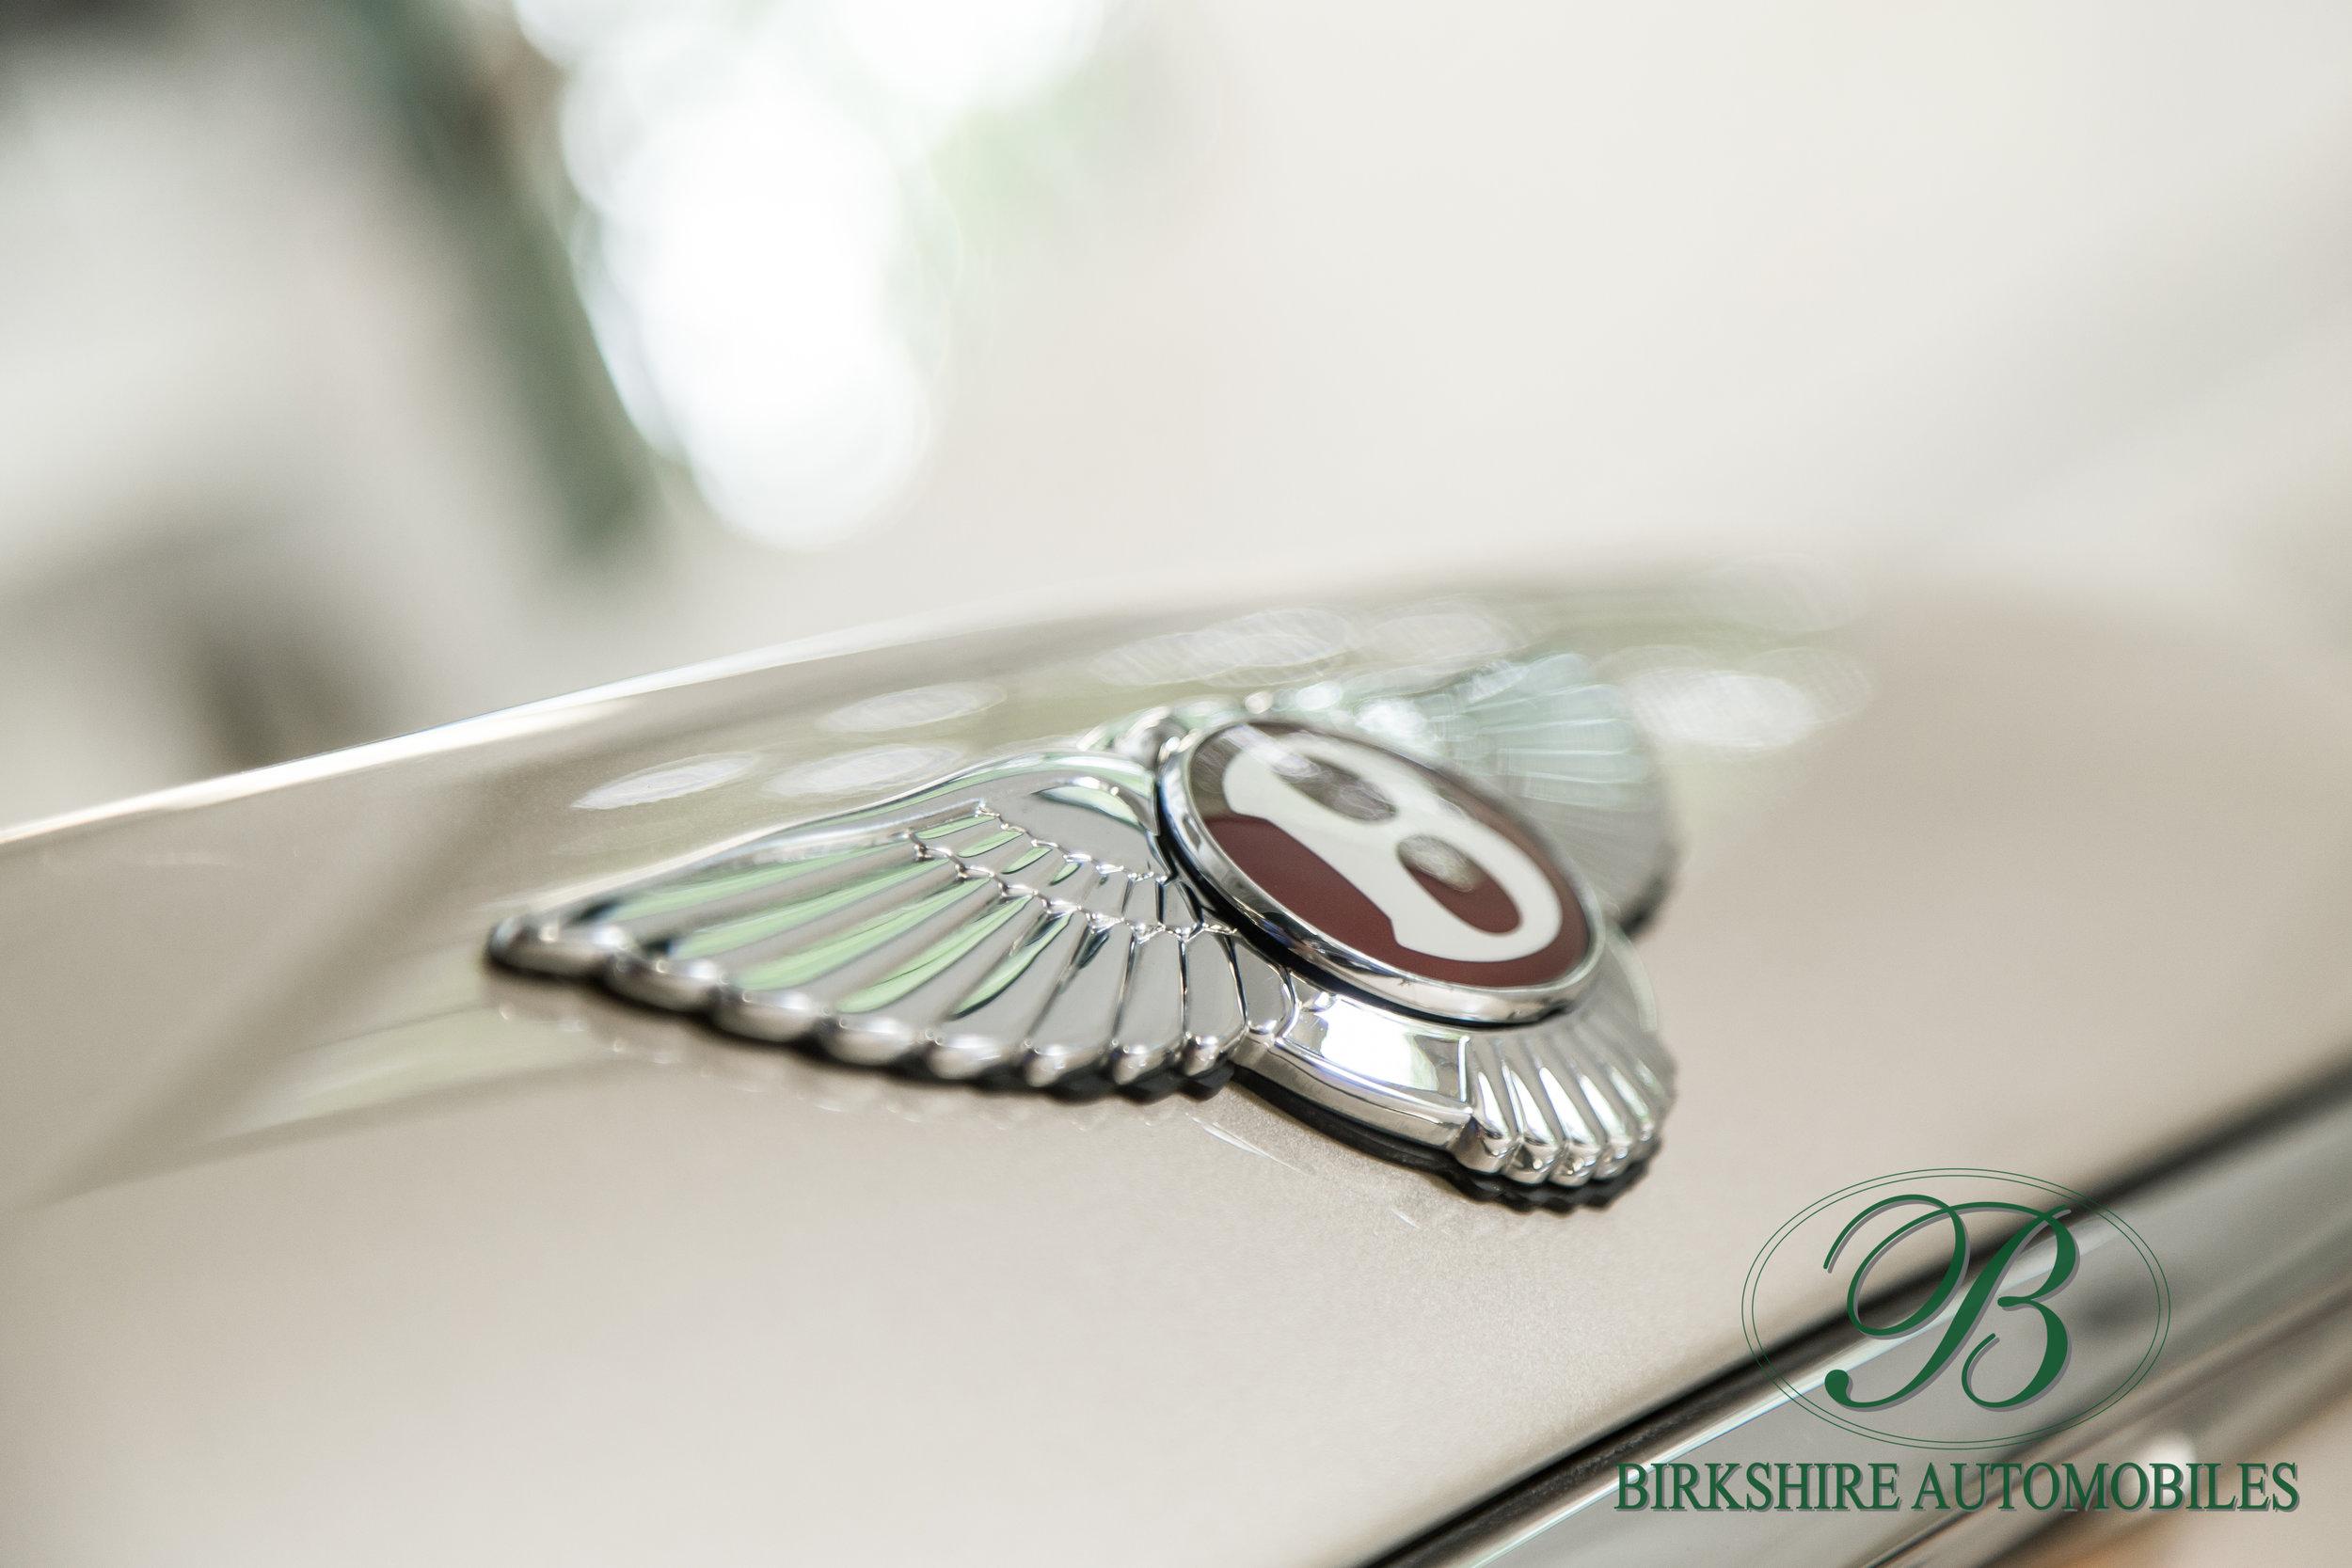 Birkshire Automobiles-347.jpg